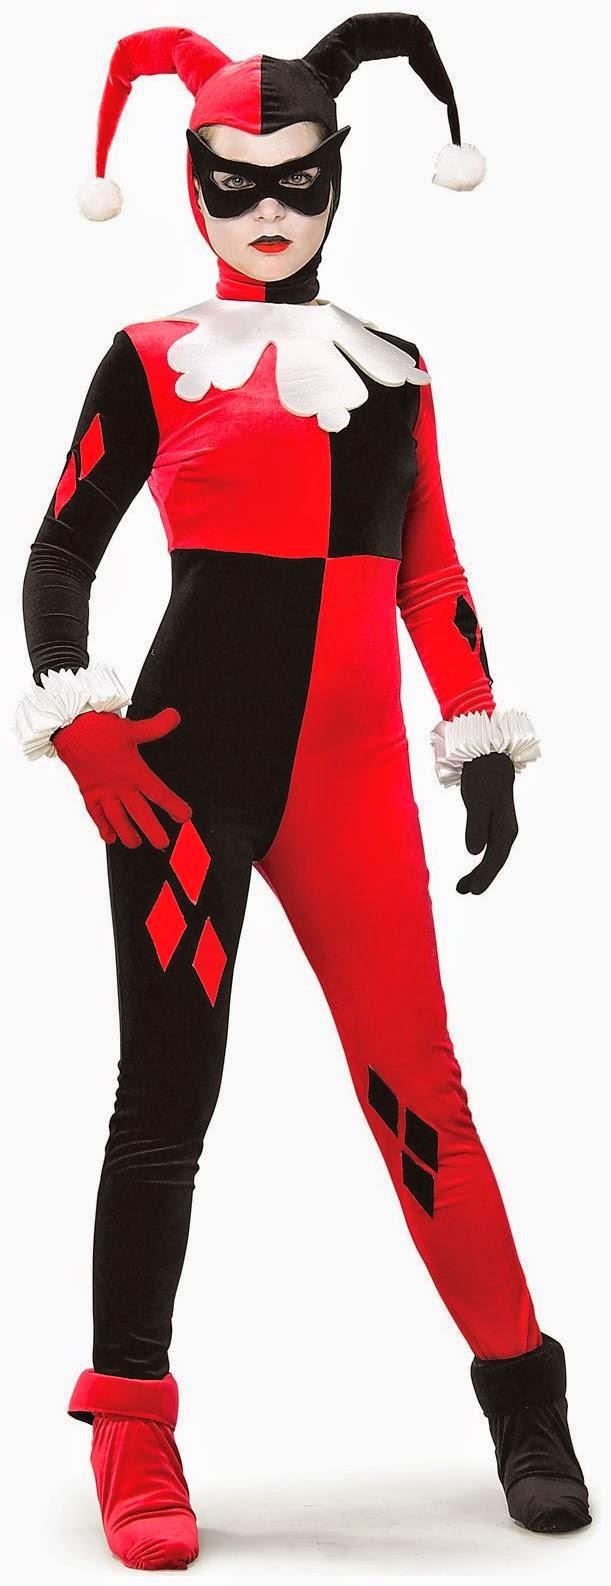 http://www.partybell.com/n.mardi-gras-costumes.0-0-25-0-181-0-0-0.aspx?utm_source=Blog&utm_medium=Navi&utm_campaign=Mardi%20Gras